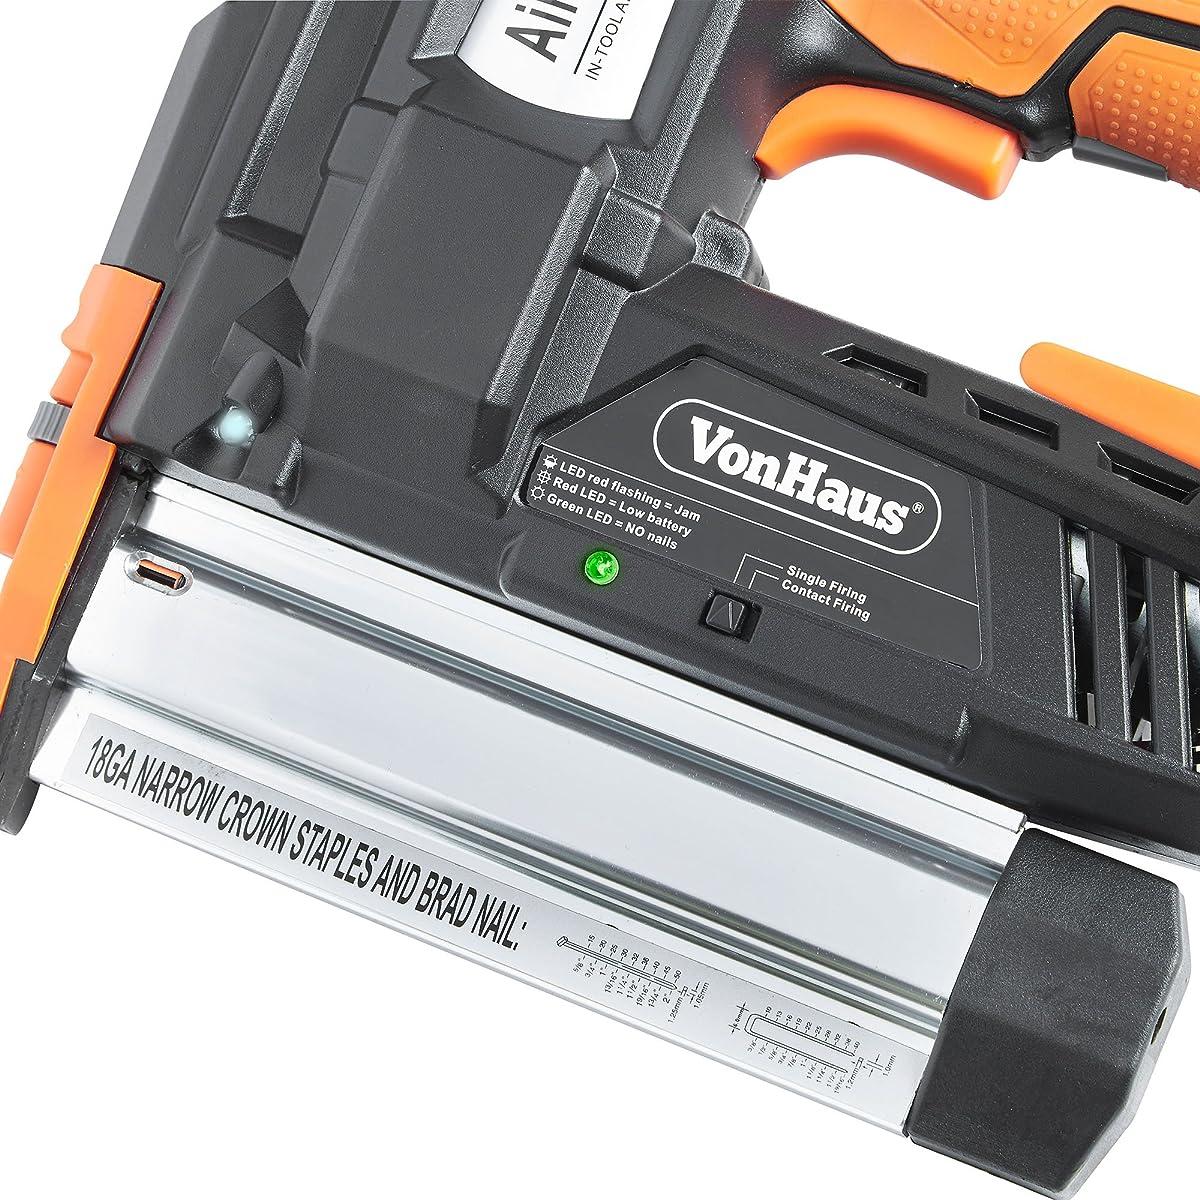 VonHaus 2 in 1 Cordless Brad Nailer & Stapler Kit - Includes 2Ah 18V Li-Ion Battery, Charger & 200 Nails/Staples